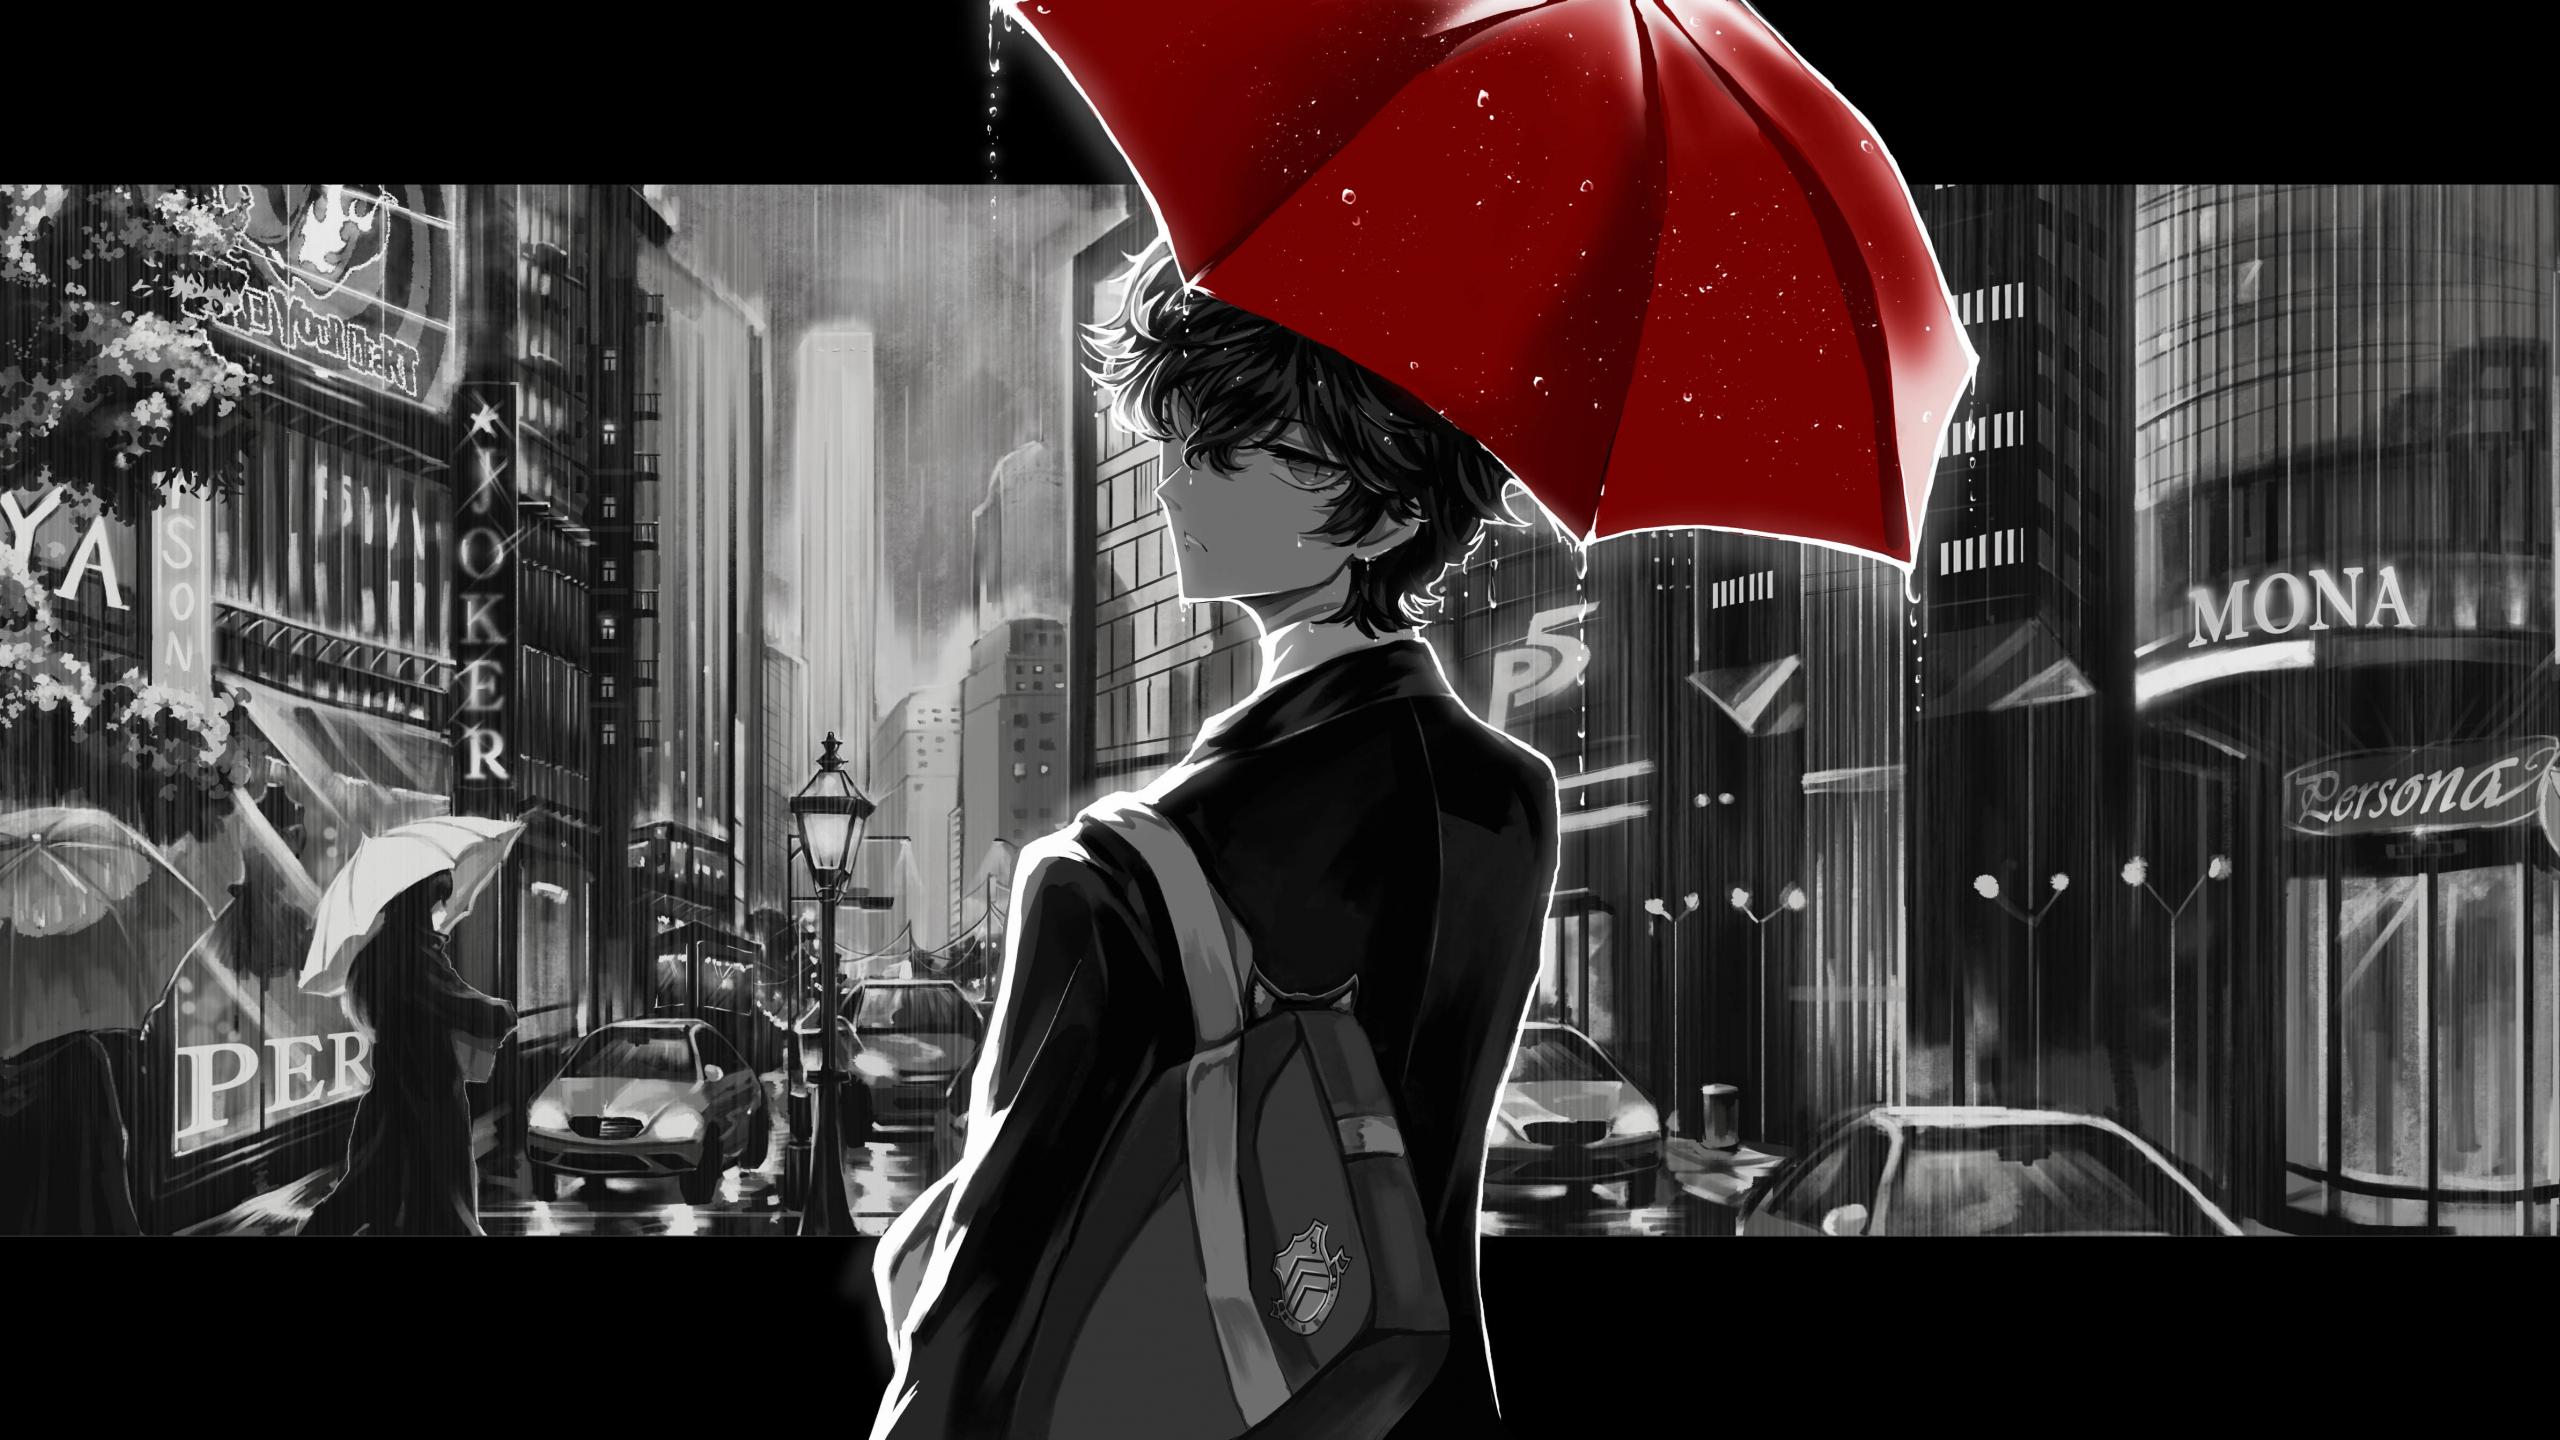 Download 2560x1440 Wallpaper Persona 5 Video Game Akira